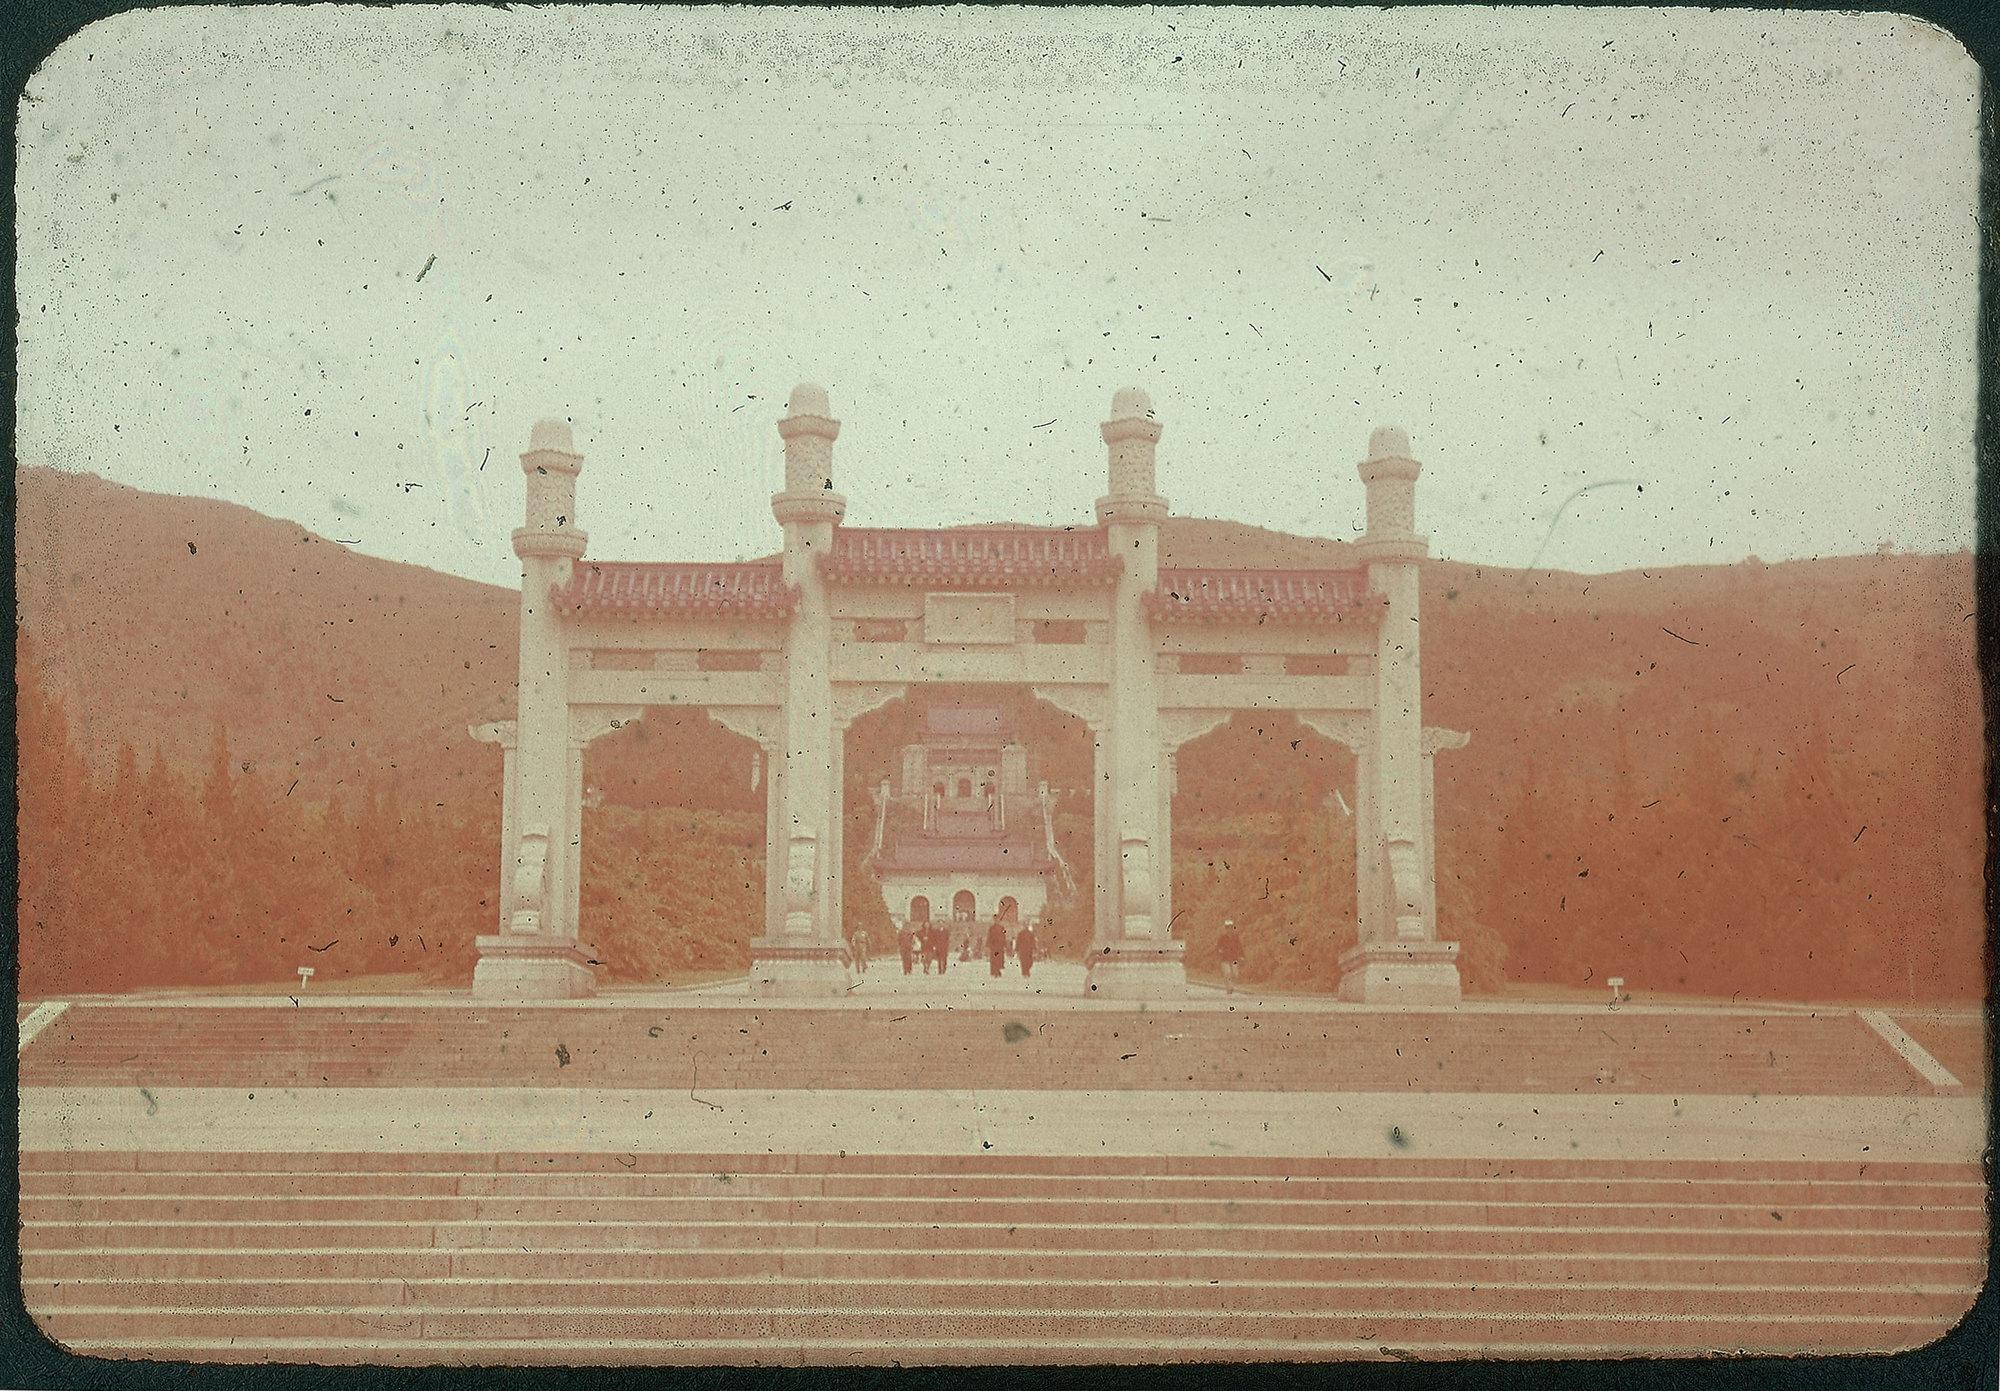 Hiller 09-035: Sun Yat-sen Mausoleum in Nanking 1